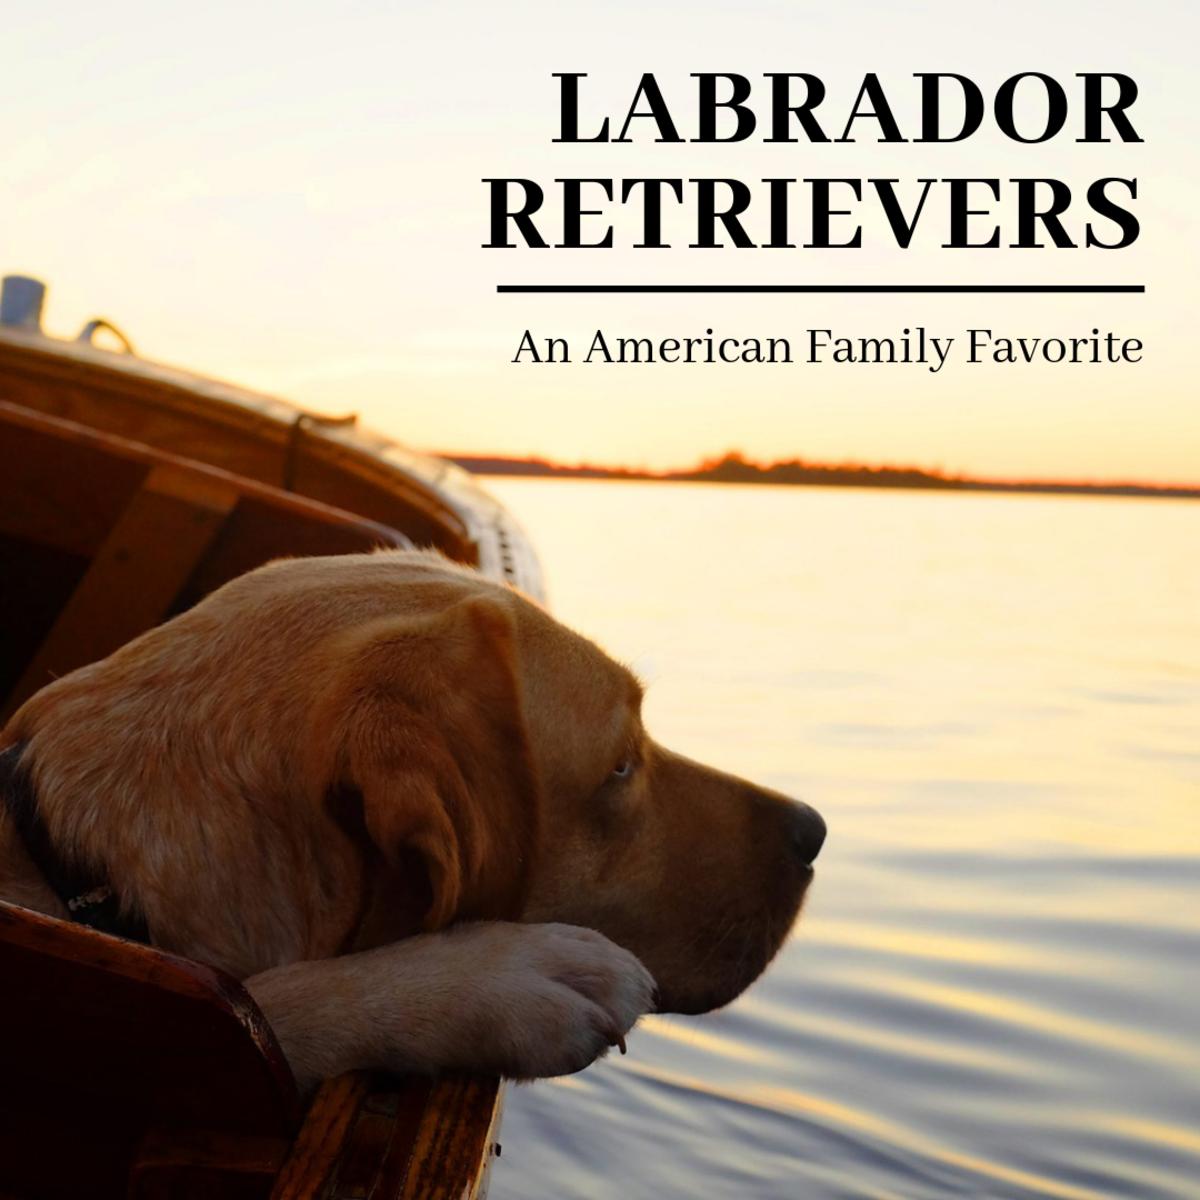 Labrador Retriever Breed Information: The Doggie Matchmaker